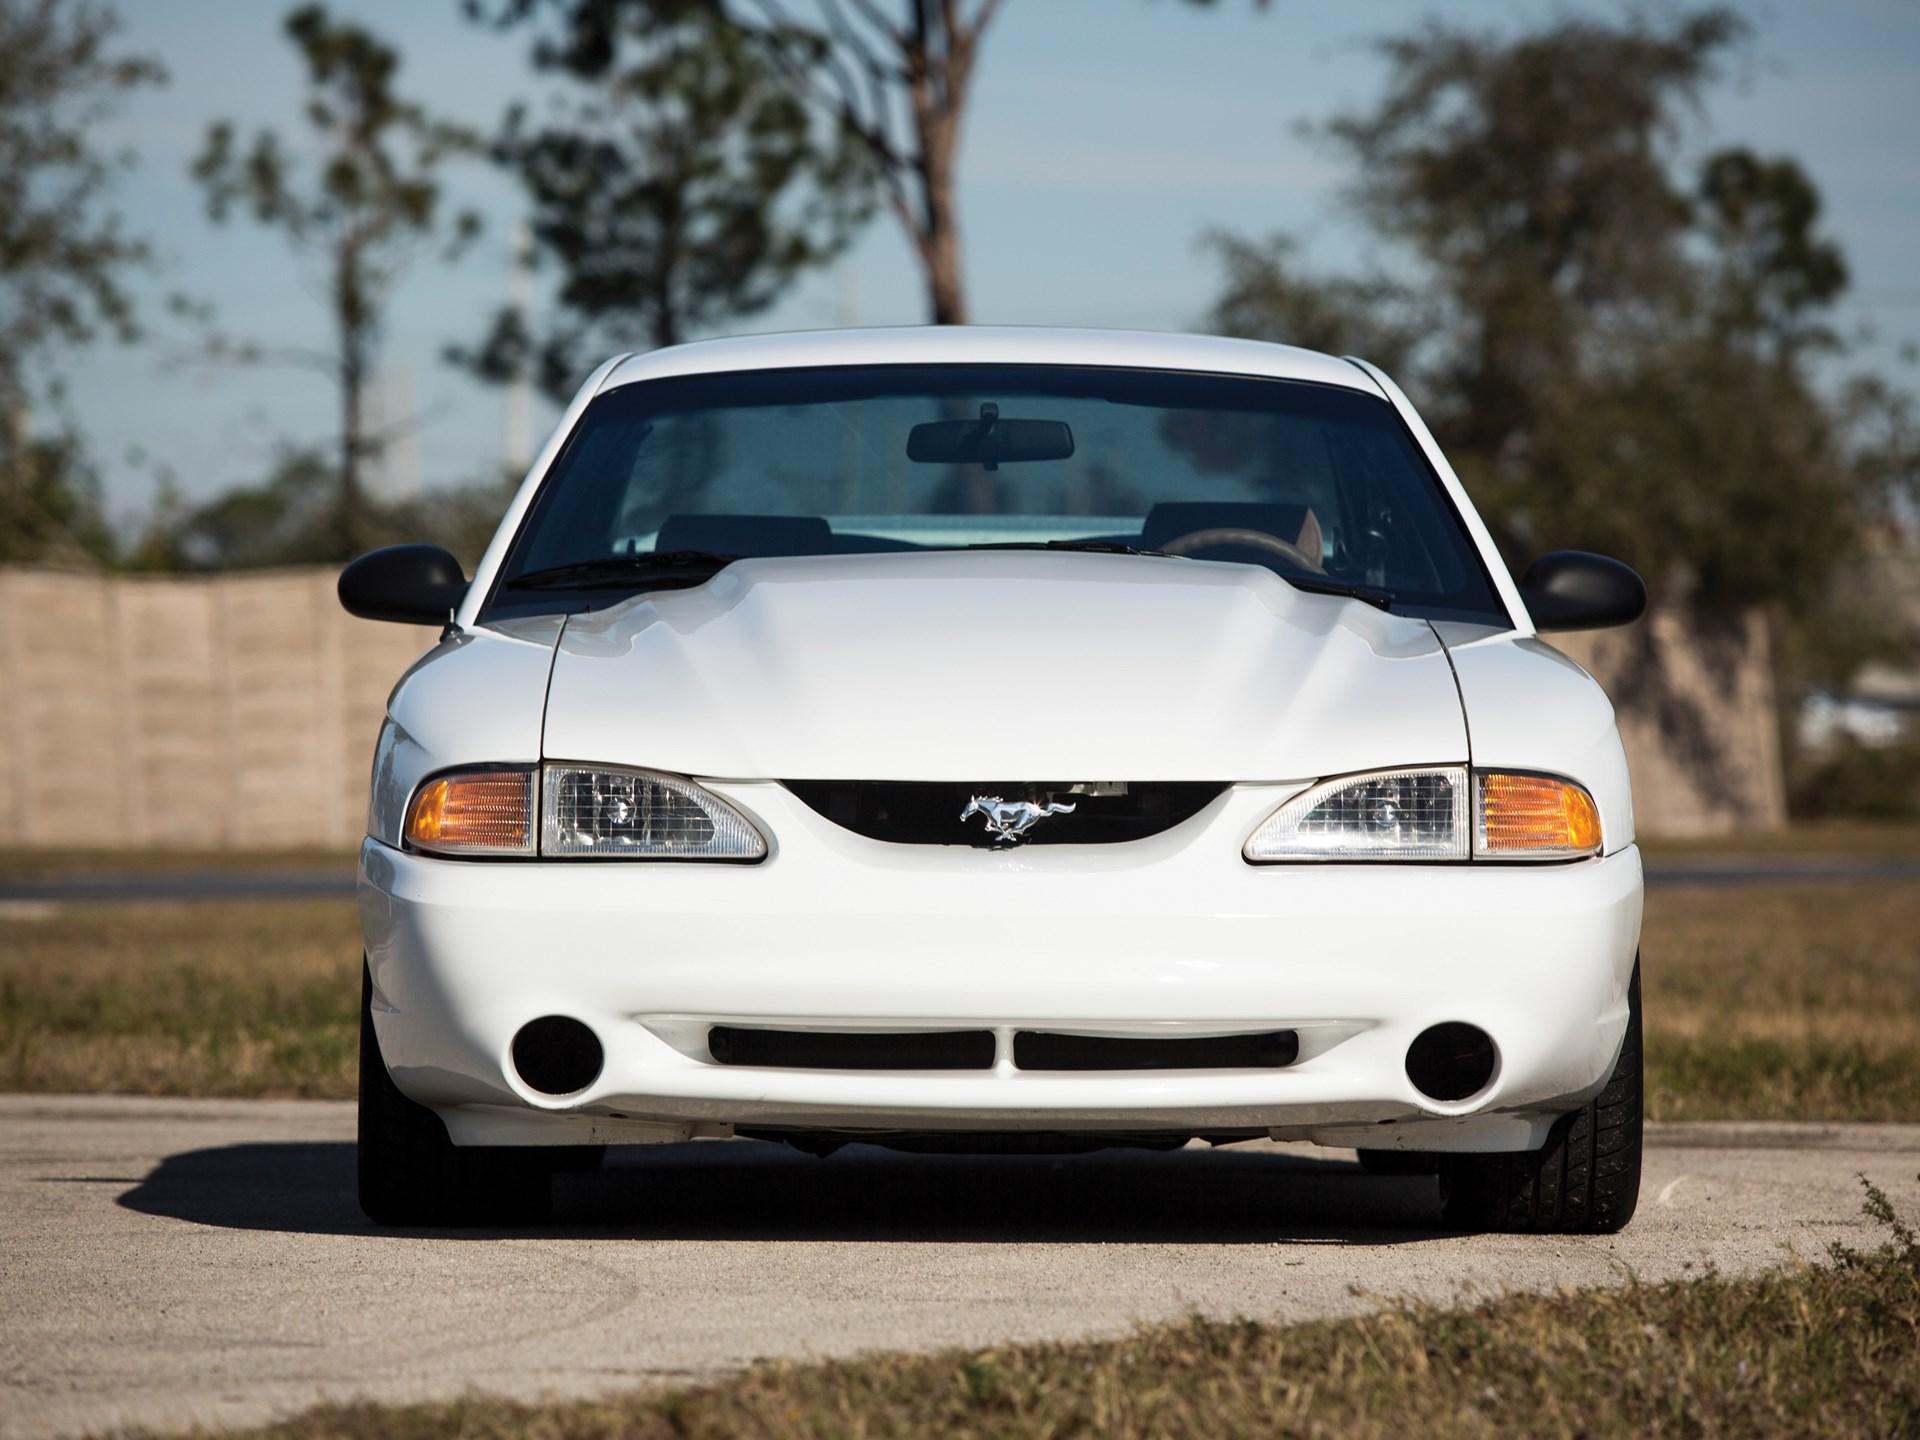 1995 Ford Mustang SVT Cobra R Front detail